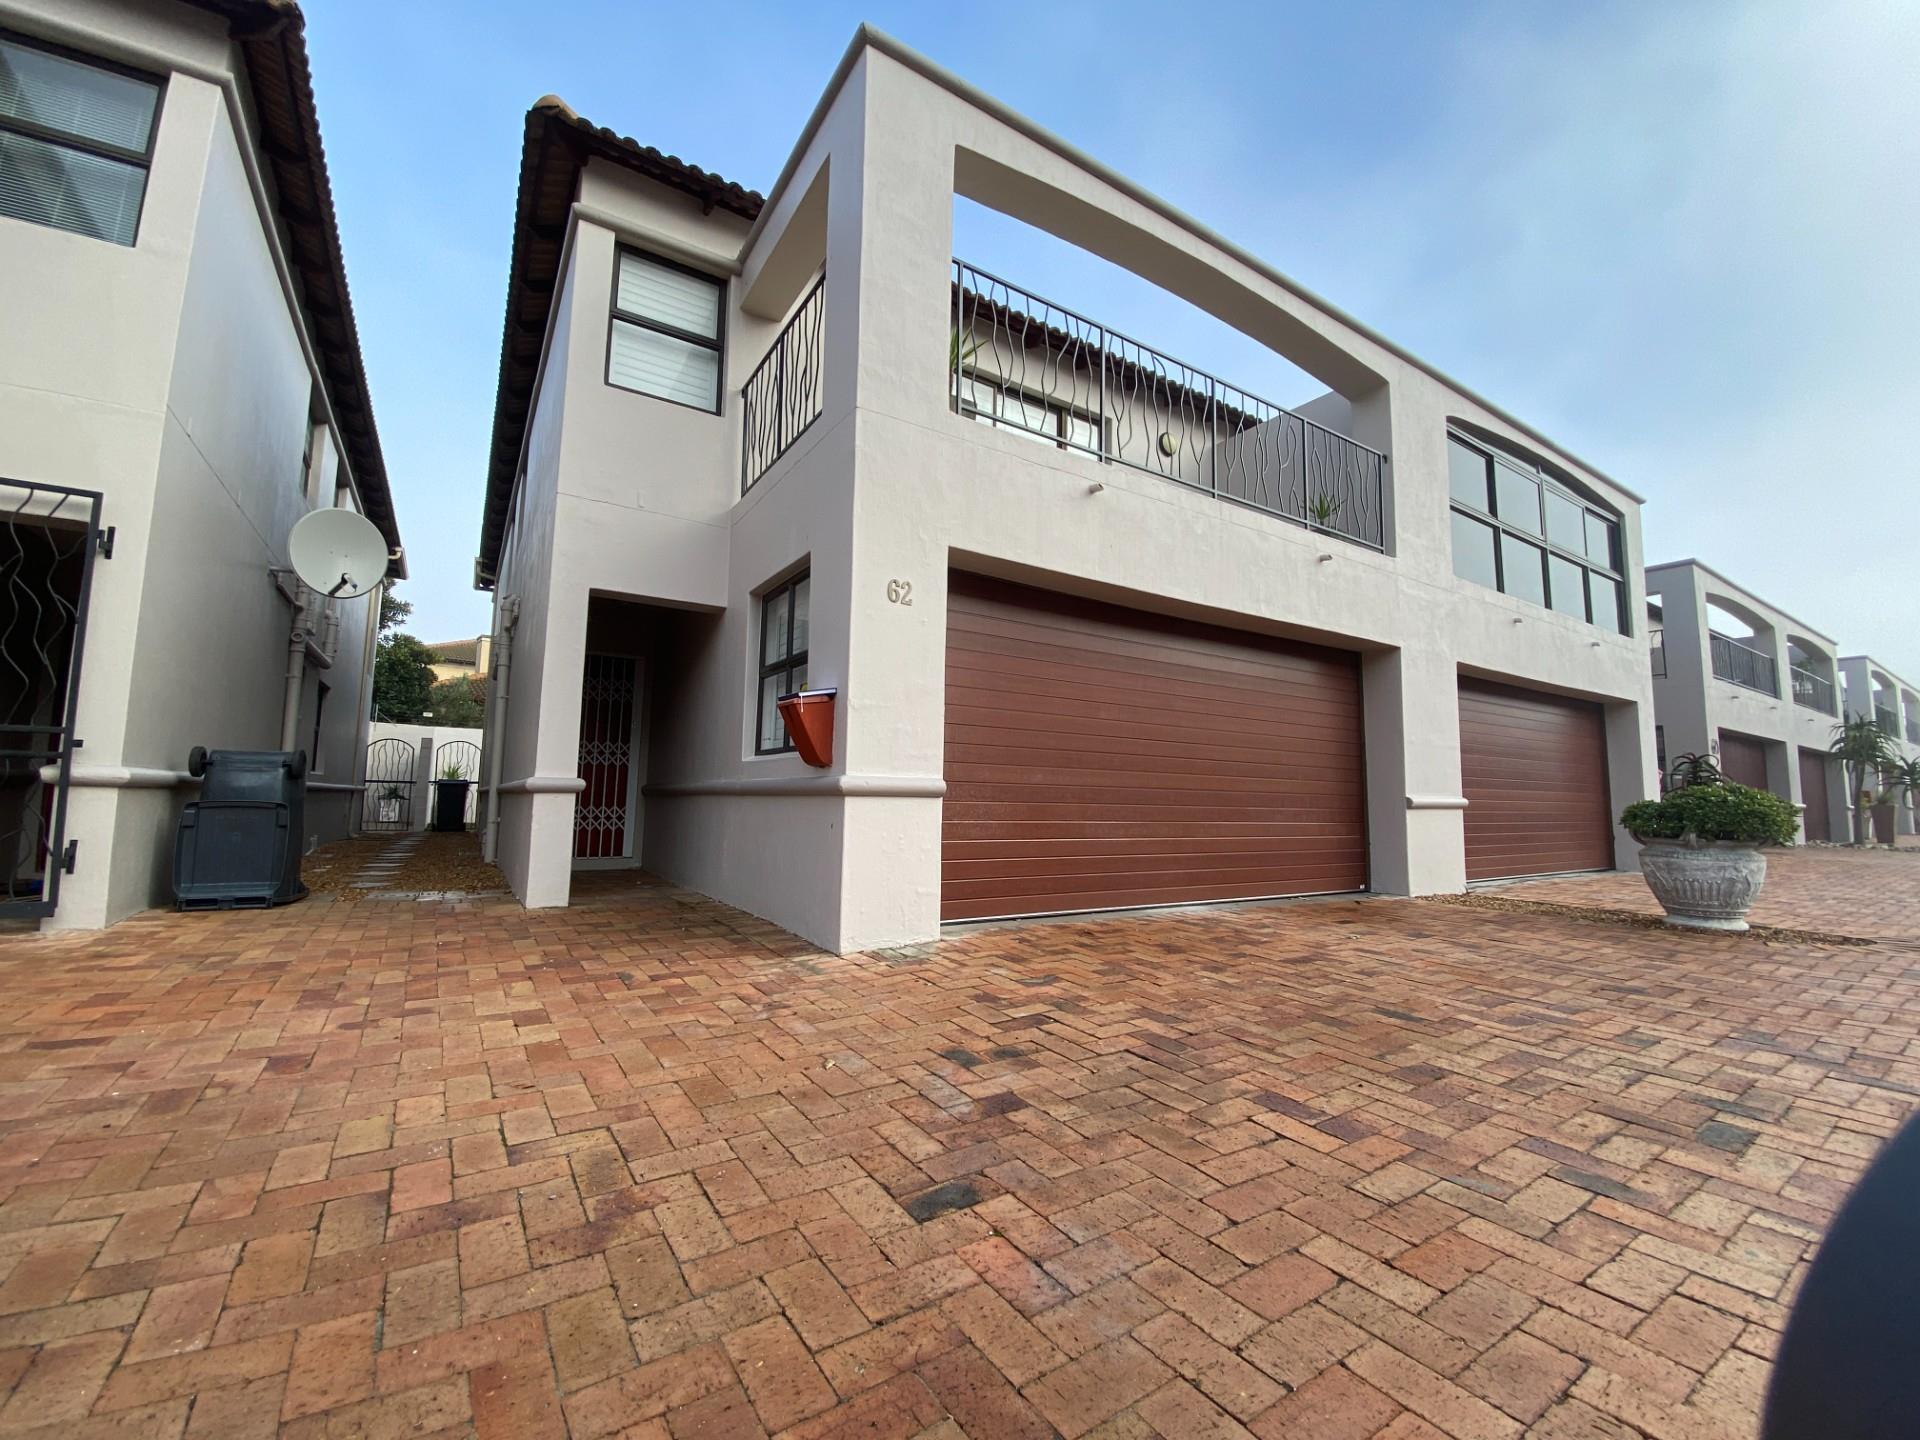 3 Bedroom House To Rent in Big Bay